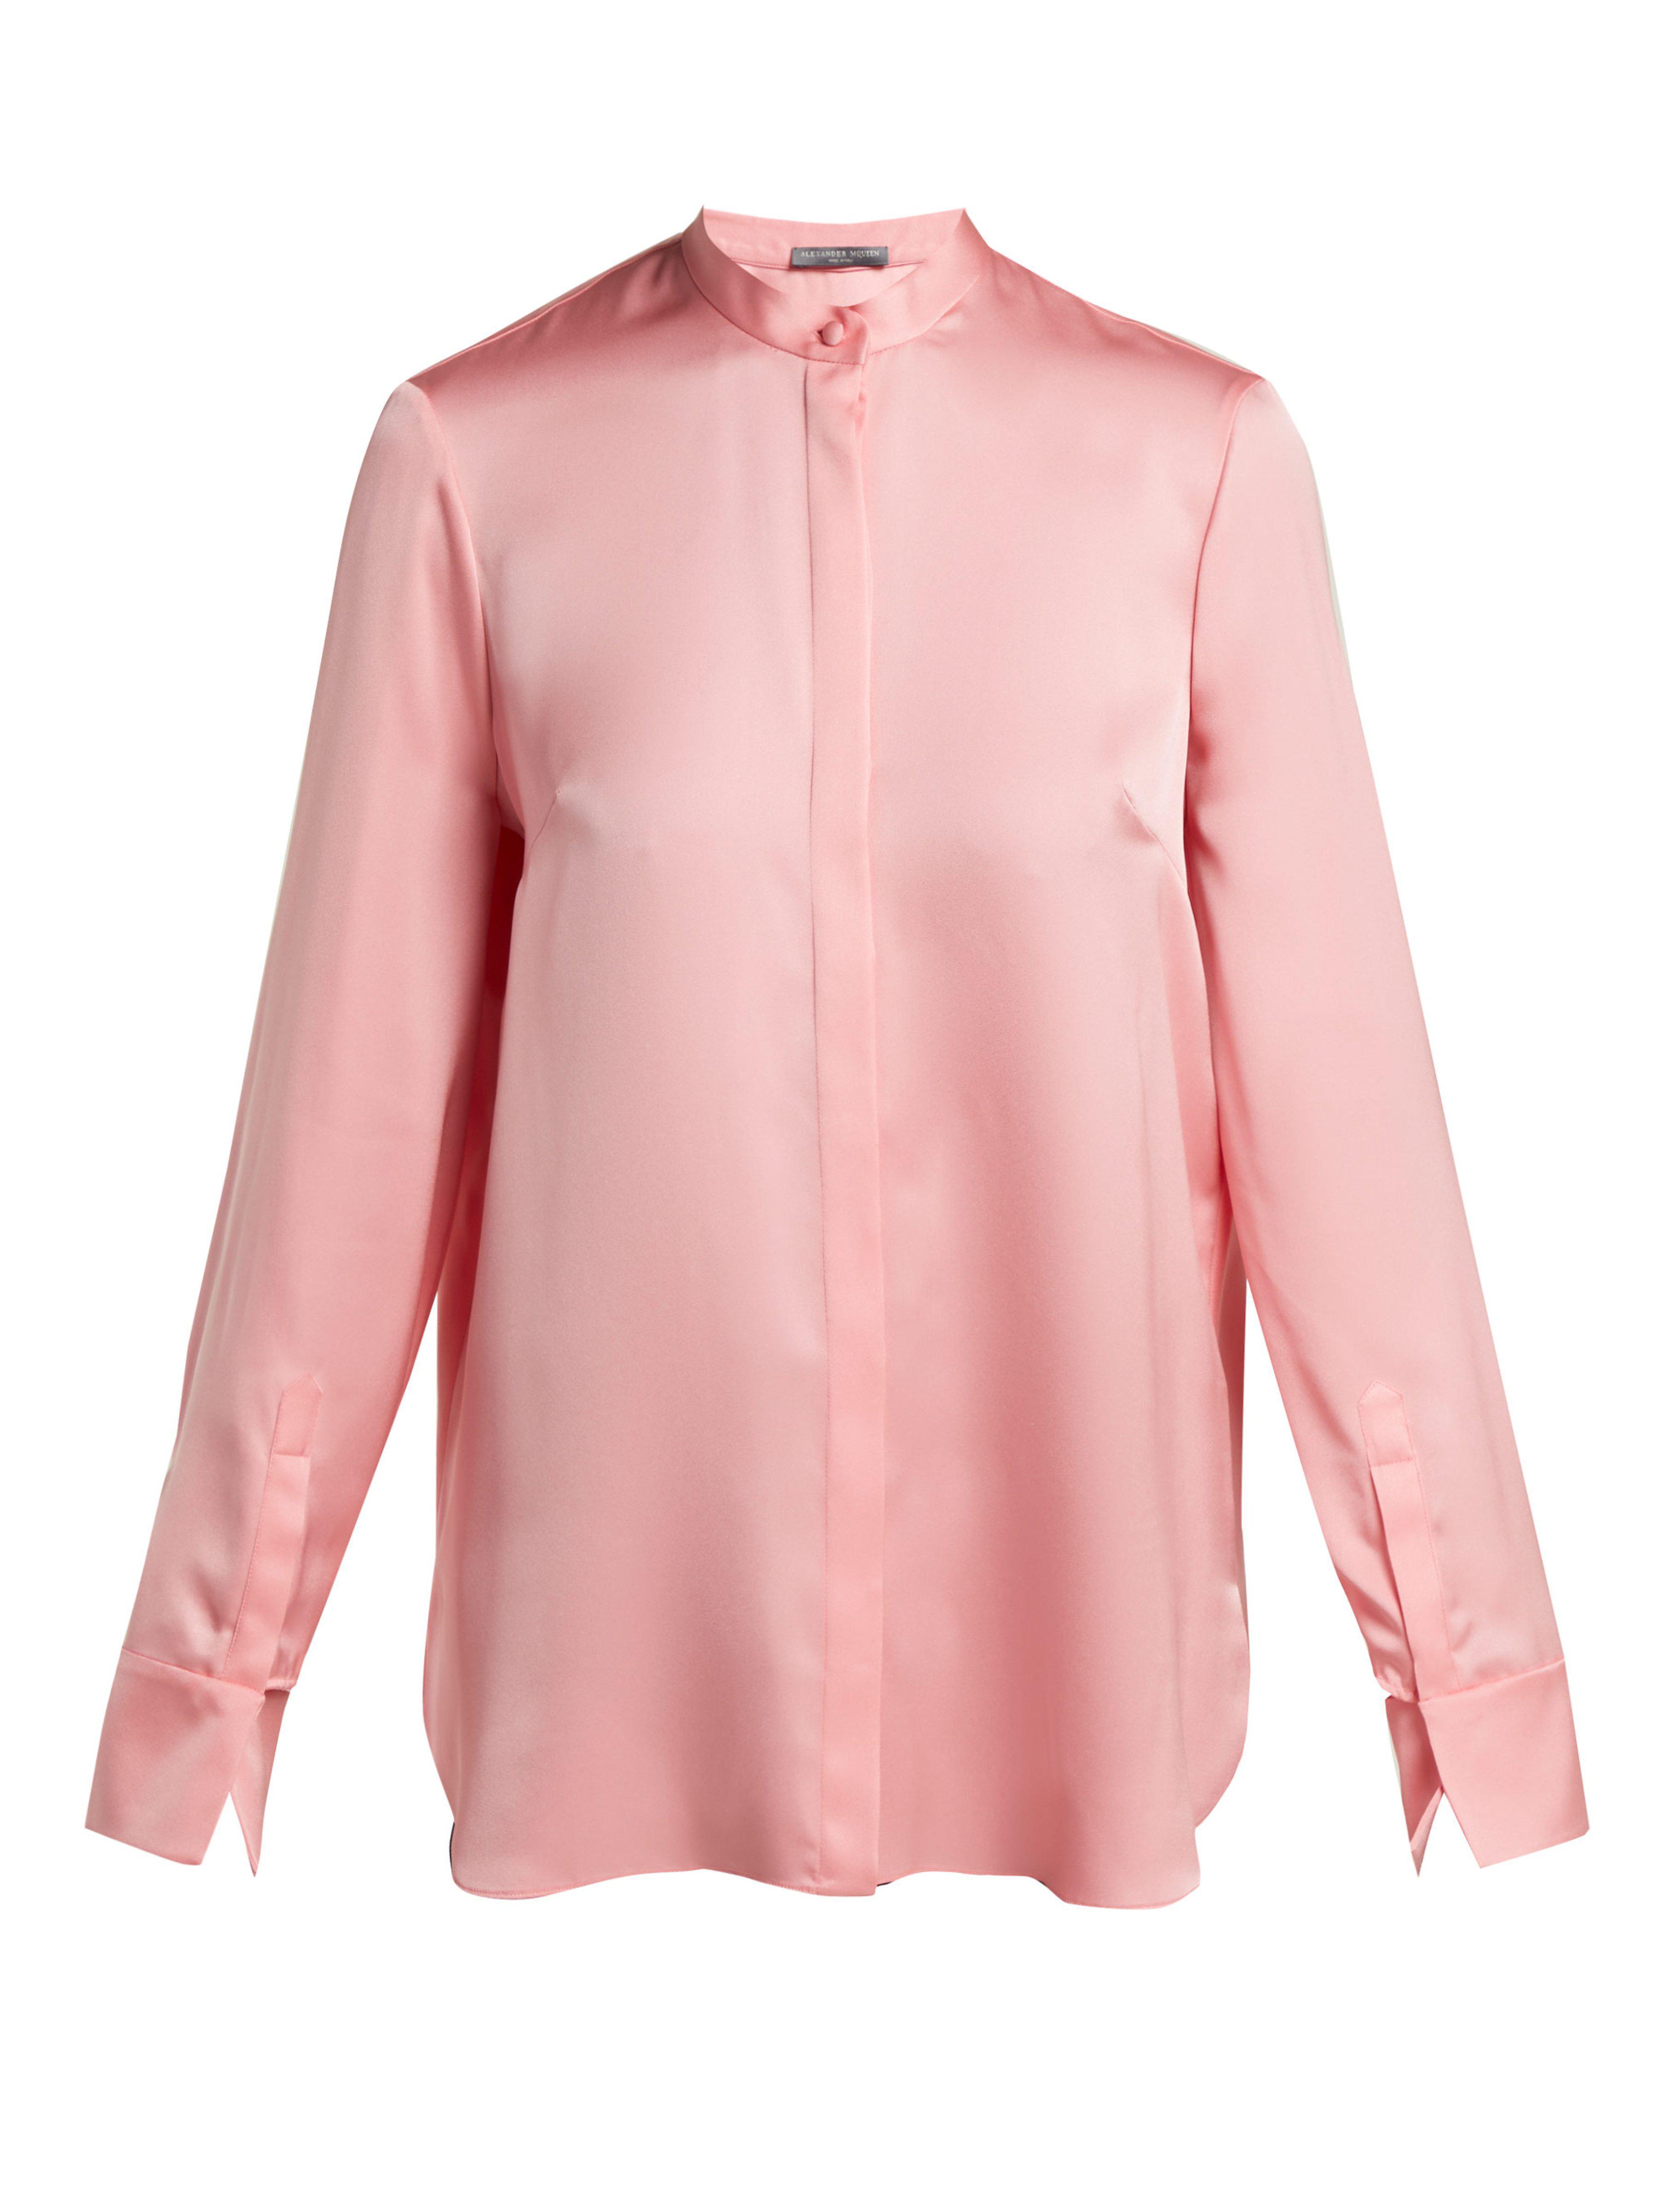 ebfb4a8b101558 Alexander McQueen Silk Satin Long Sleeve Blouse in Pink - Lyst